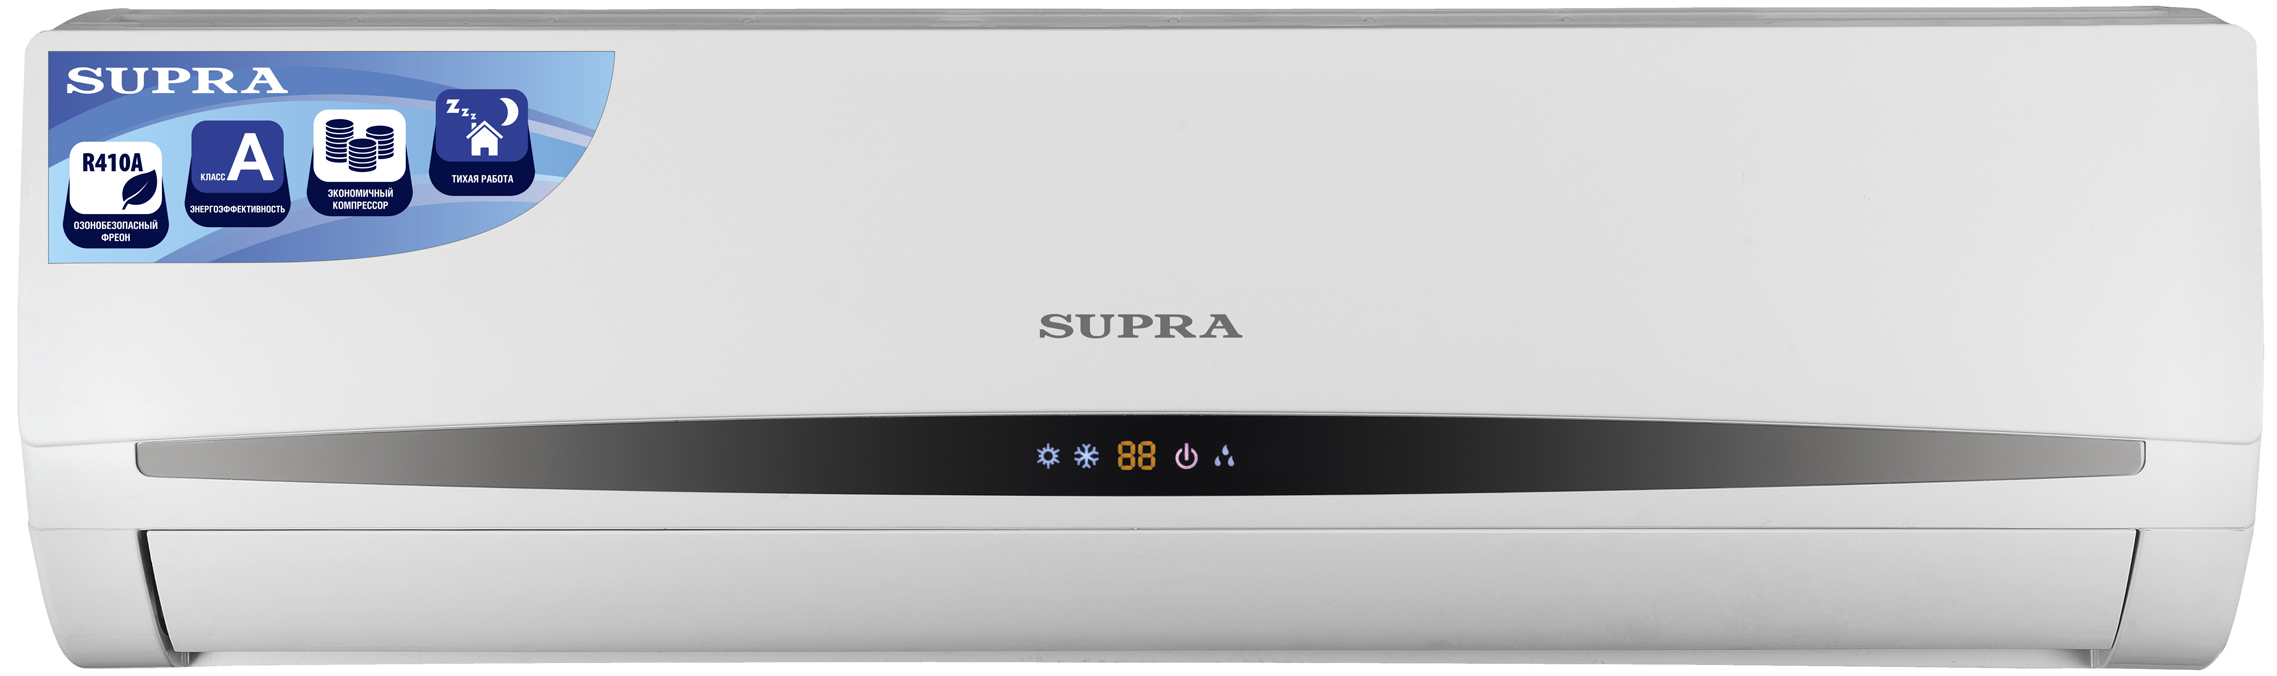 Кондиционер Supra SA09GBE